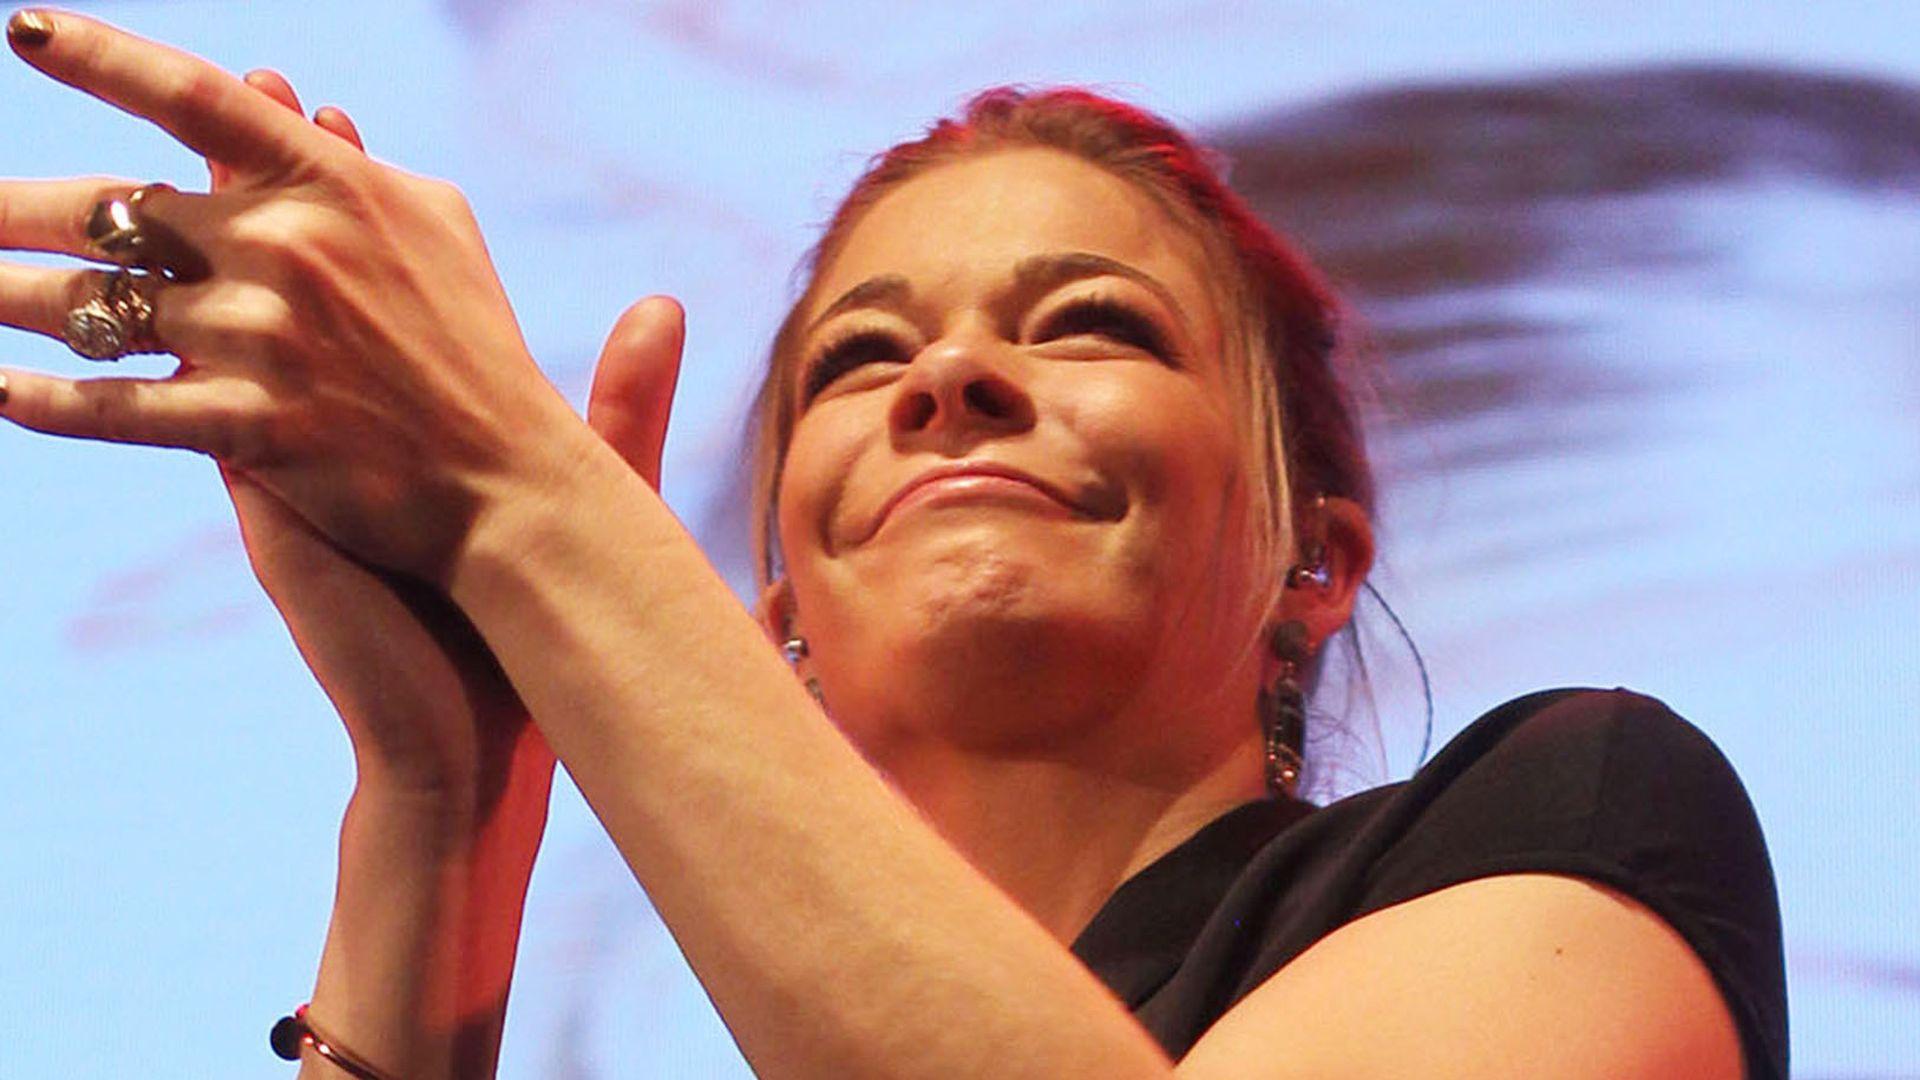 Peinlicher TV-Auftritt: War LeAnn Rimes betrunken? | Promiflash.de